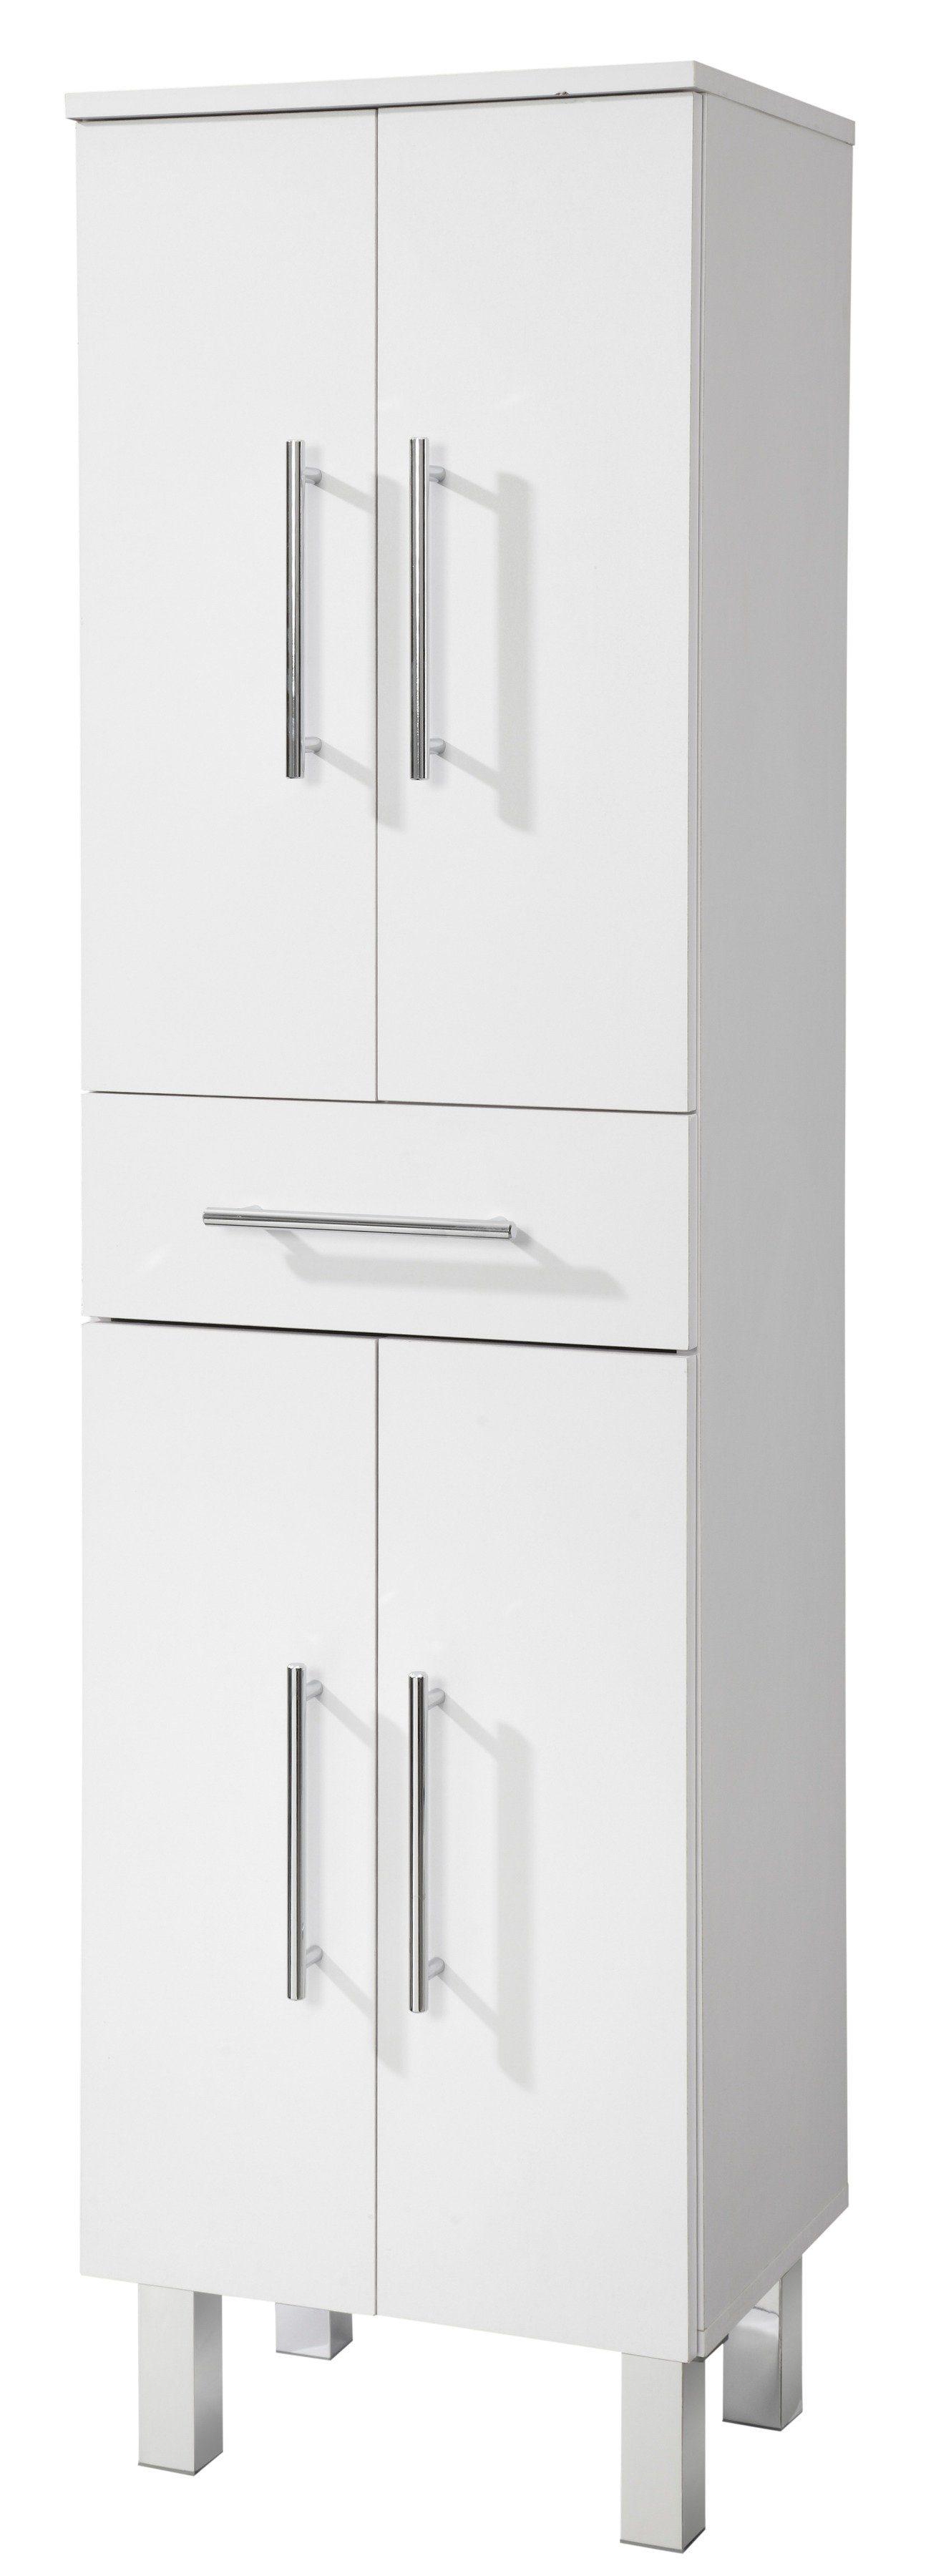 KESPER Midischrank »Novara«, Breite 40 cm